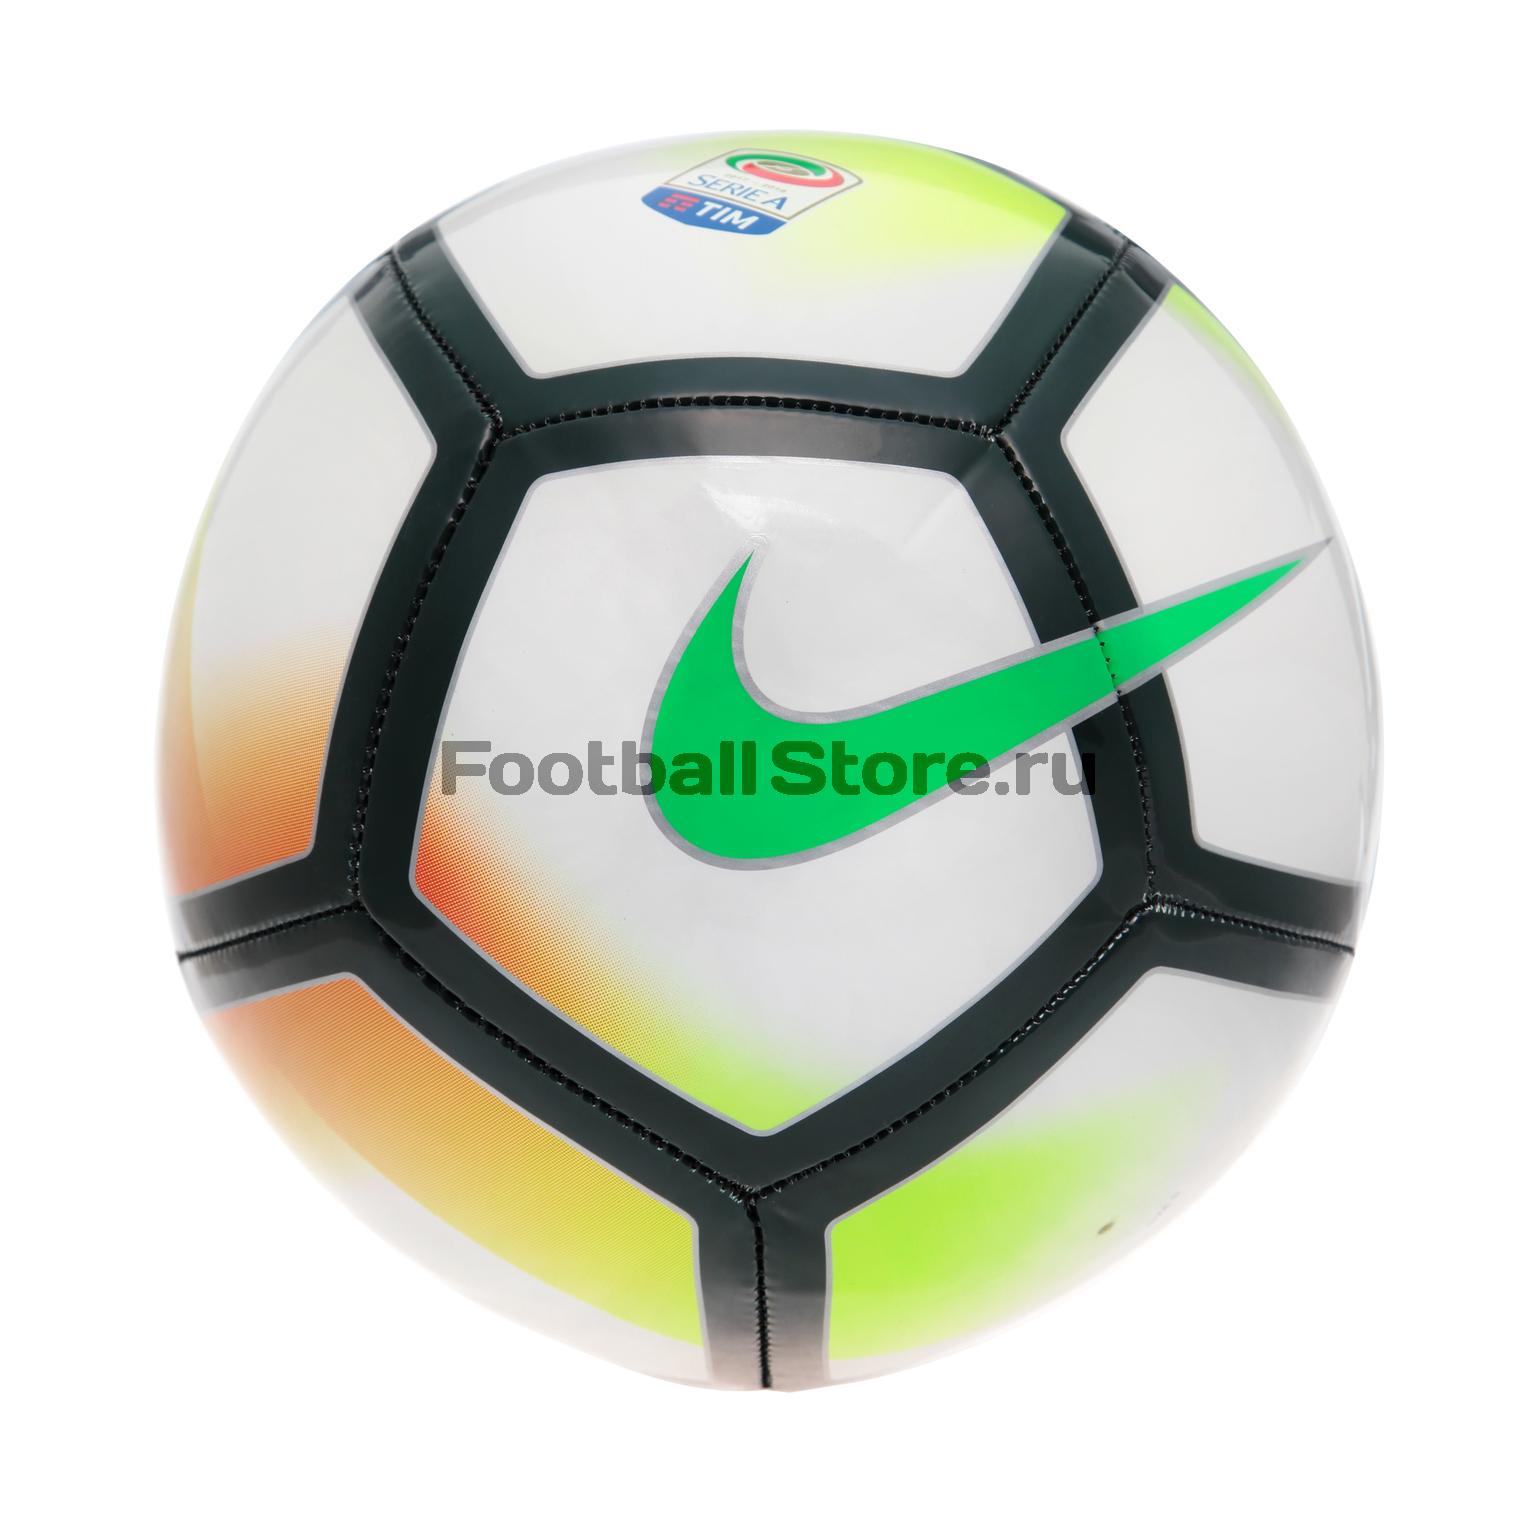 Футбольный мяч Nike Serie Pitch SC3139-100